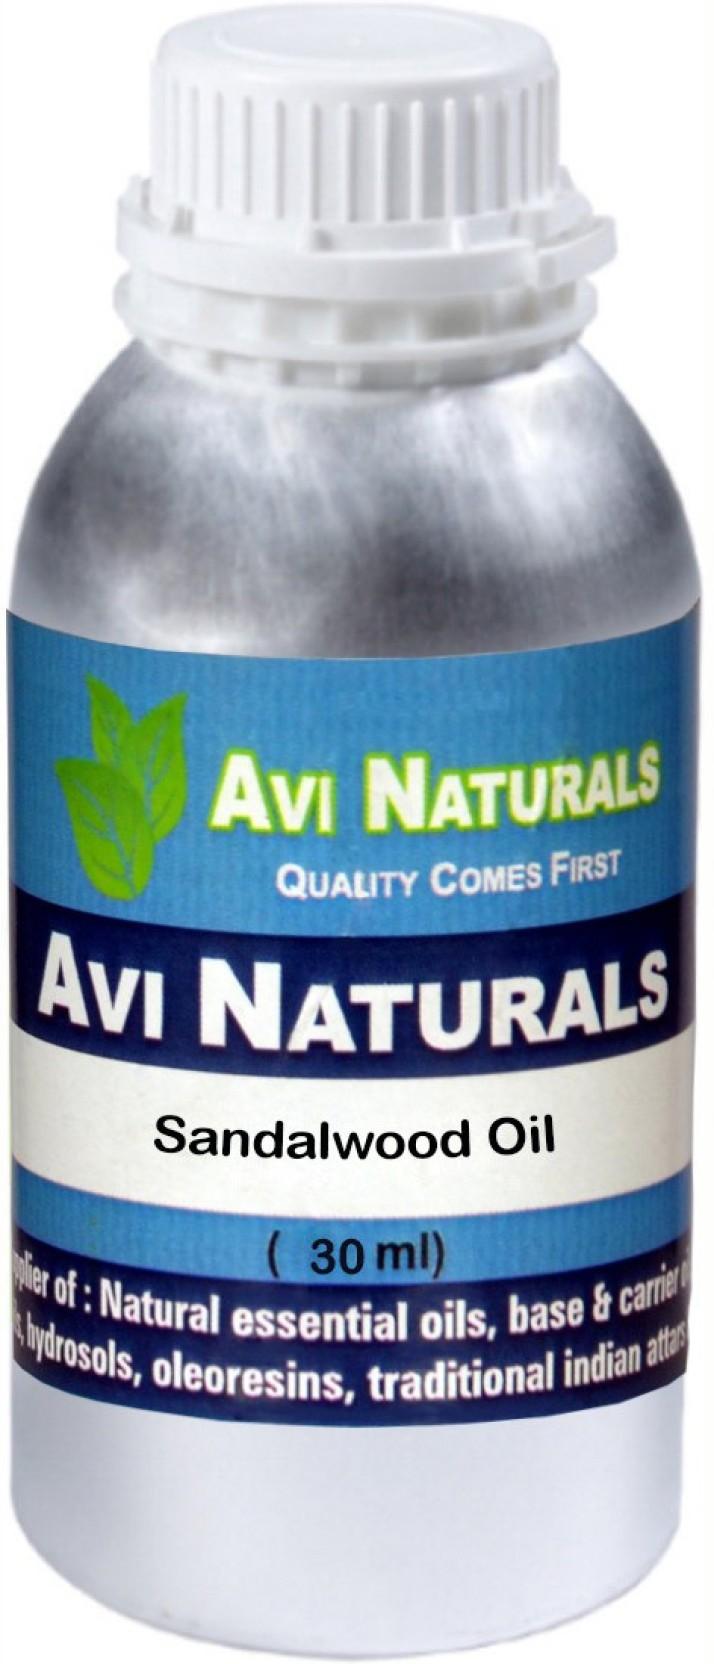 Avi Naturals Sandalwood Oil Price In India Buy Hydrosol 50 Ml Add To Cart